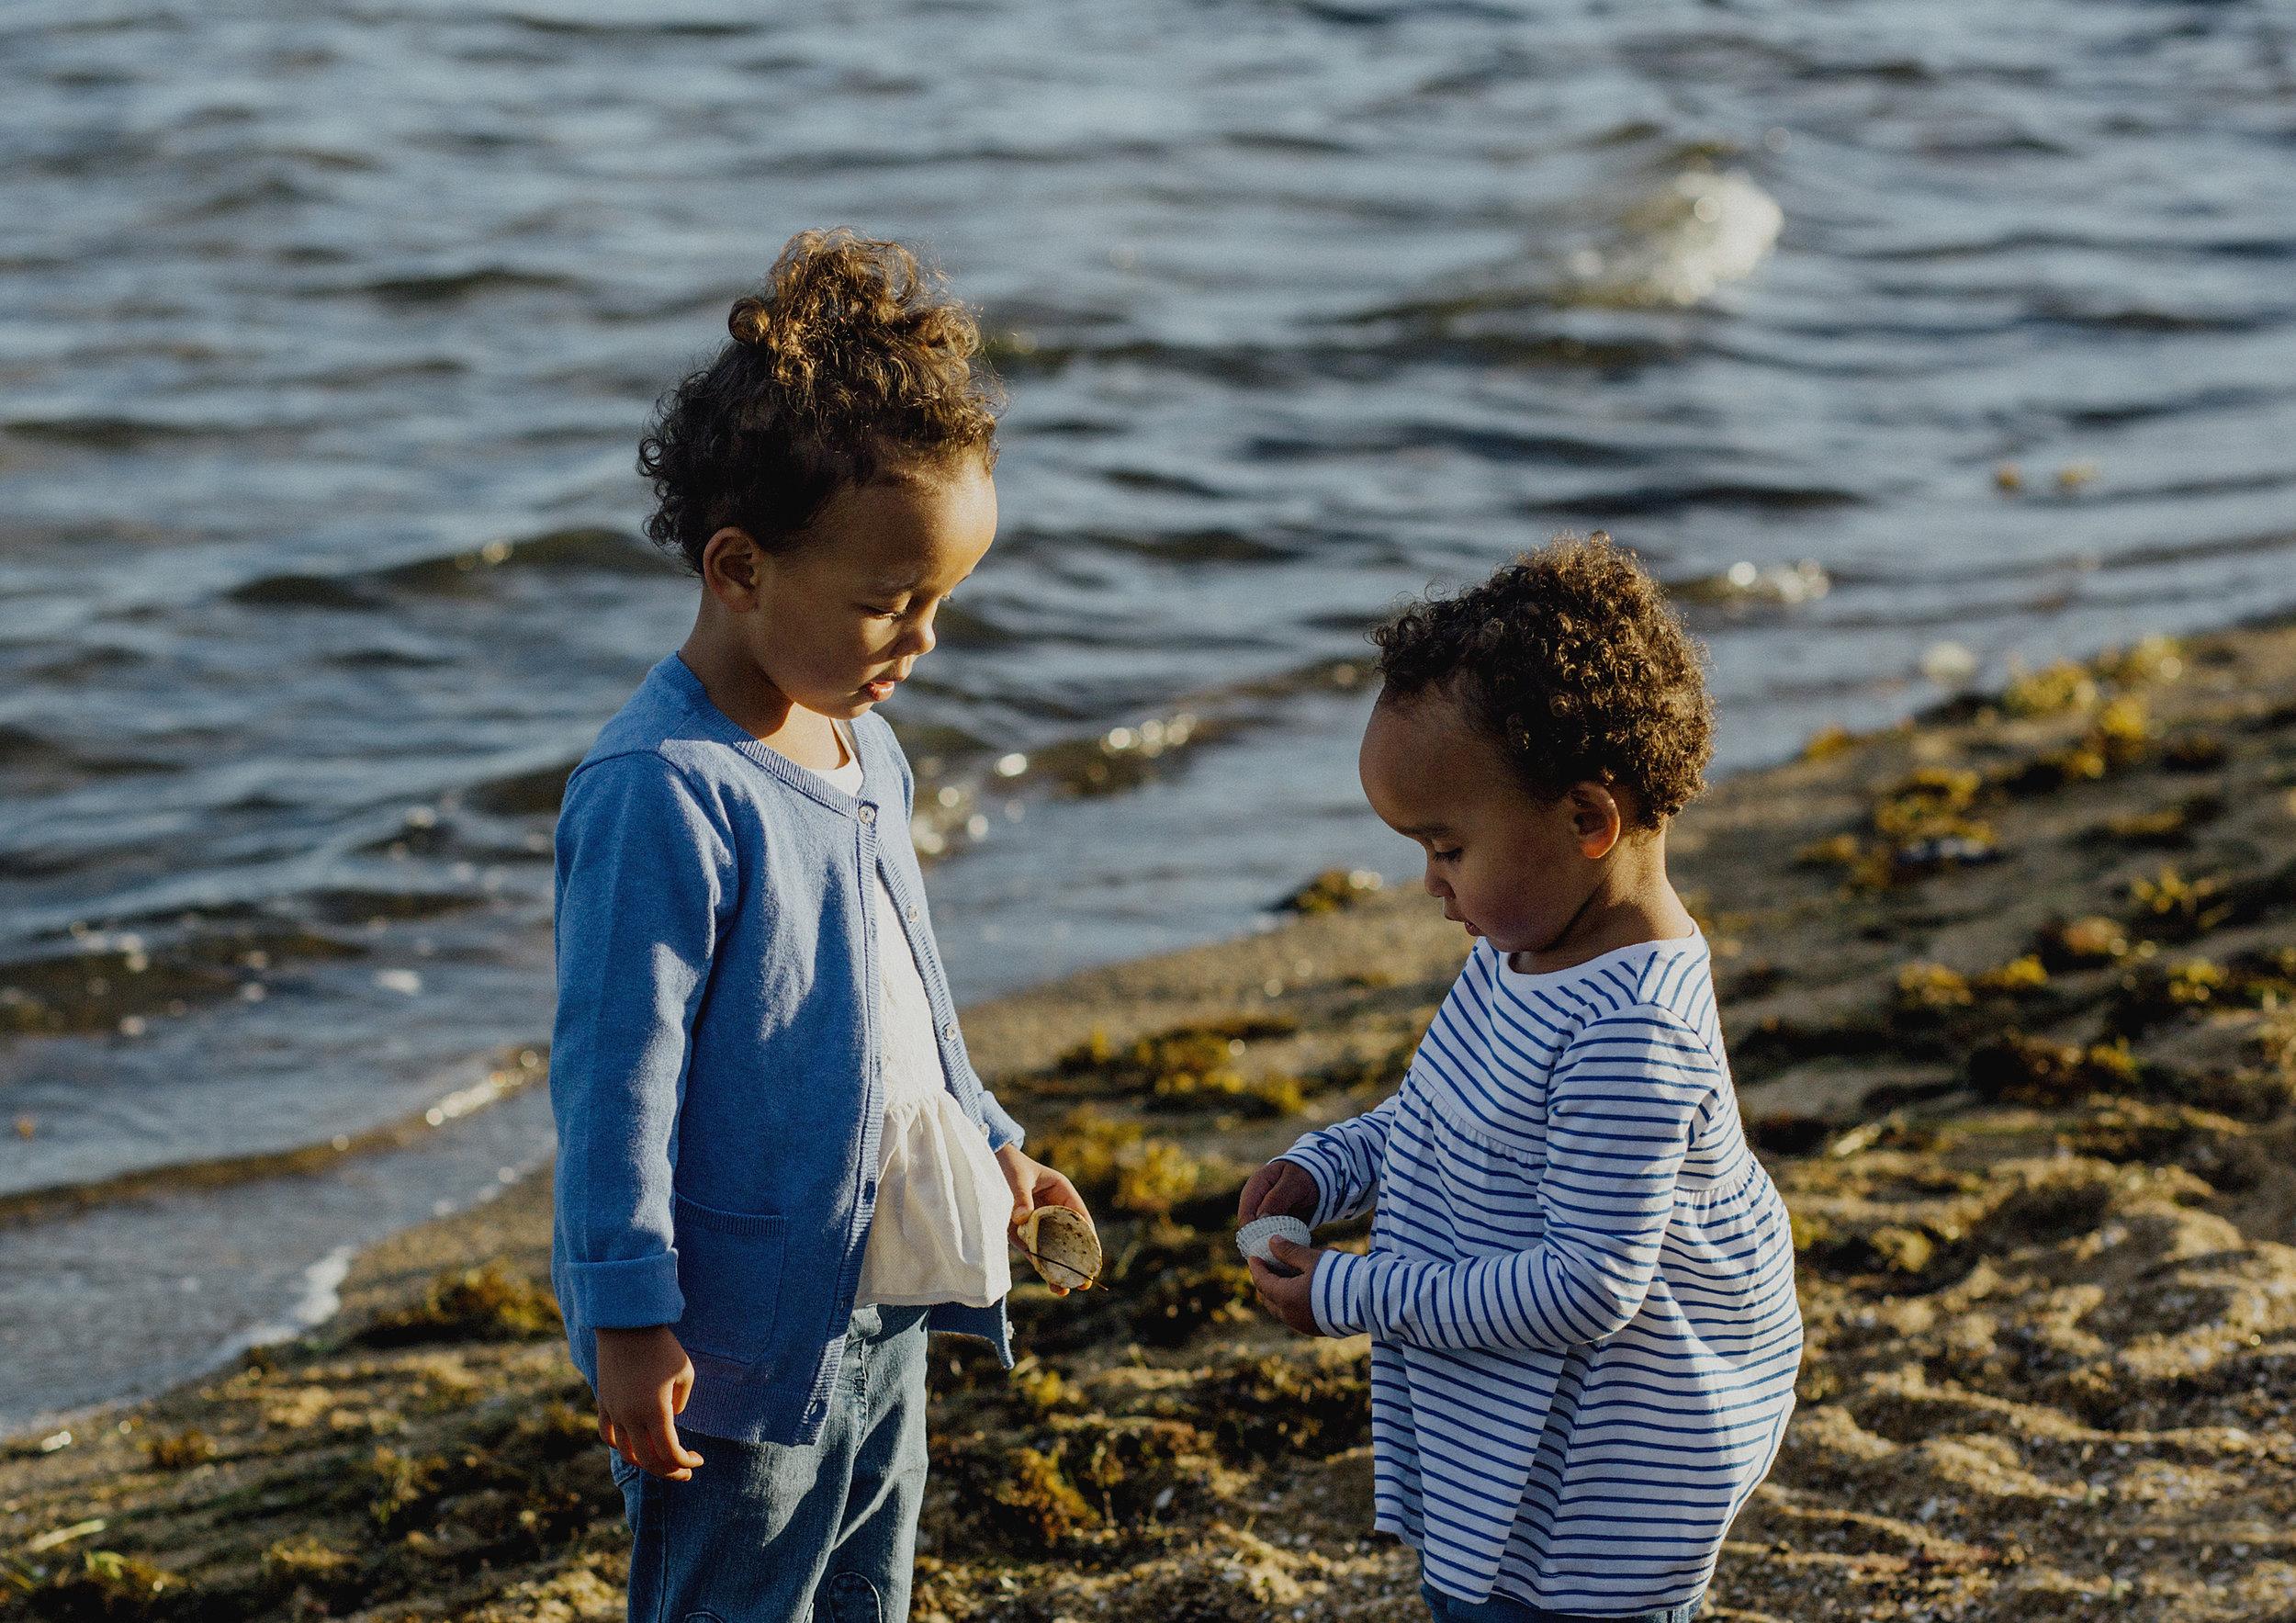 Children's Photography Melbourne